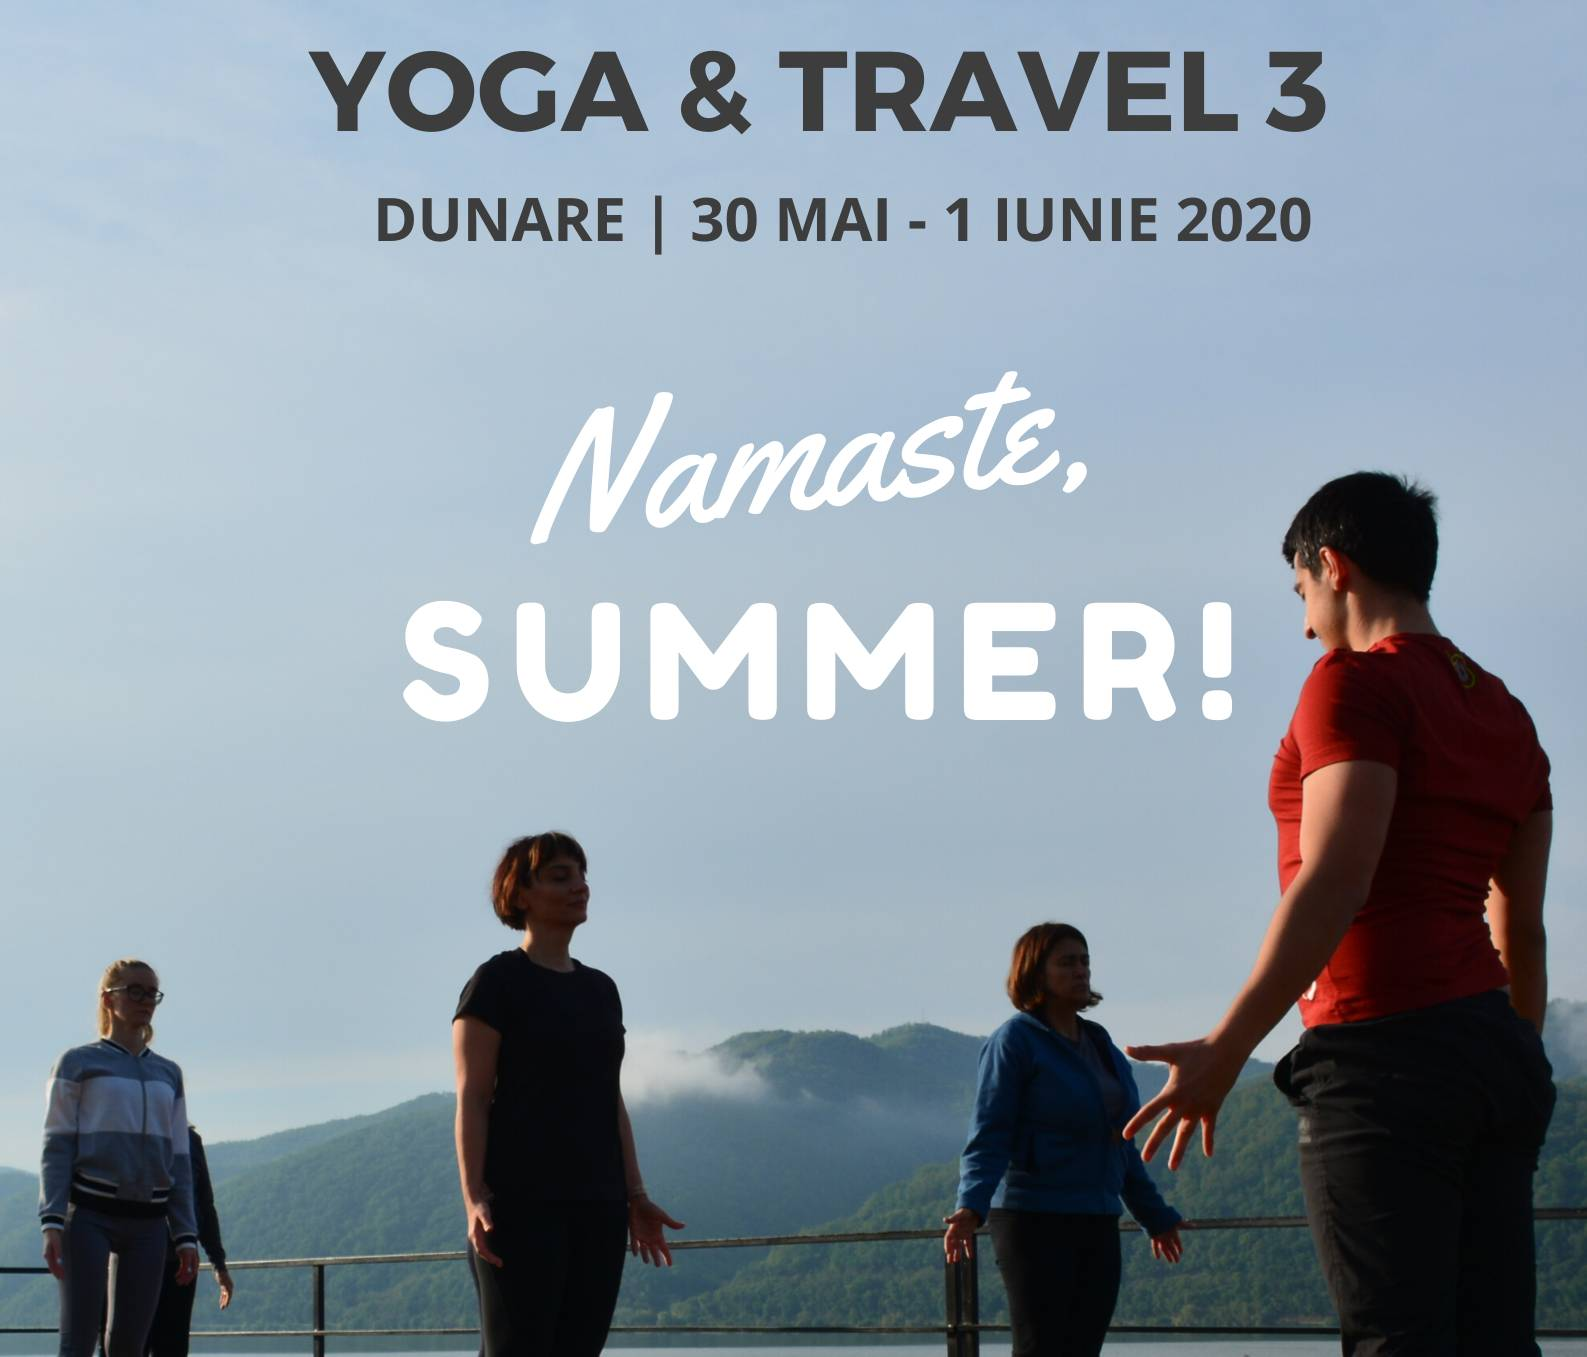 Yoga & Travel 3